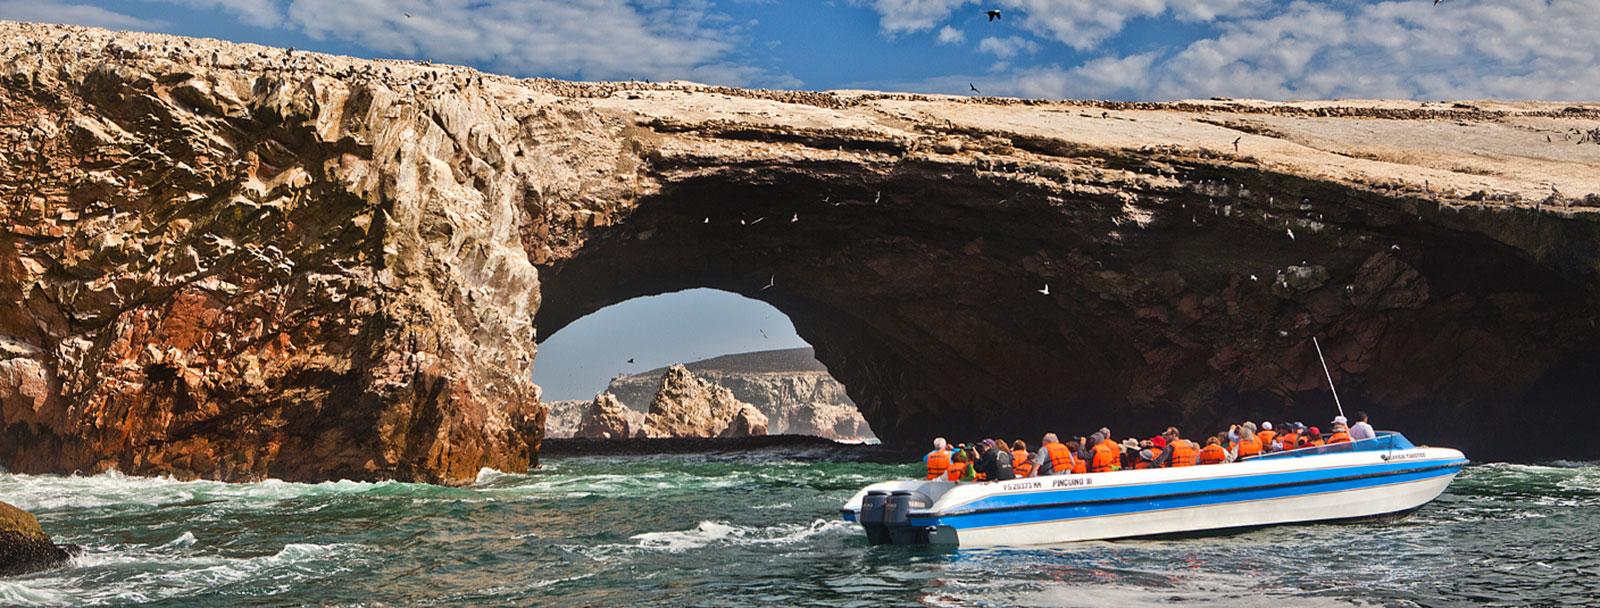 Desert cliffs overlooking a narrow strip of beach on the Pacific Ocean in Paracas.